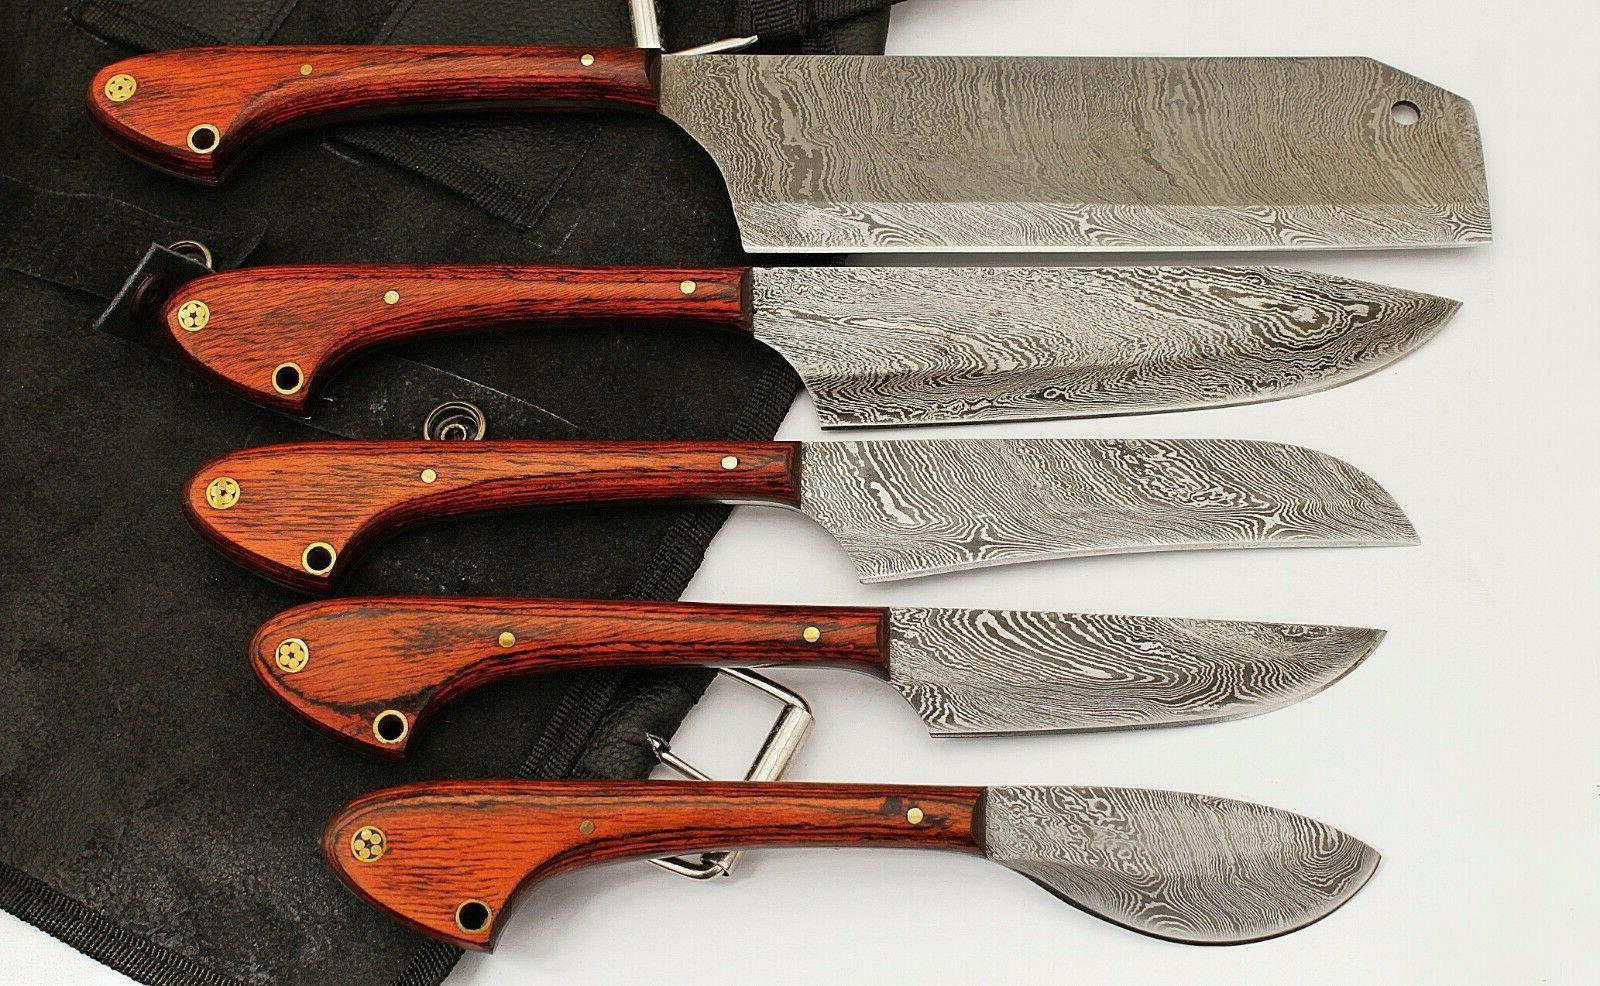 GladiatorsGuild Damascus Knife Kitchen Red Wood 5pc Chef Kni